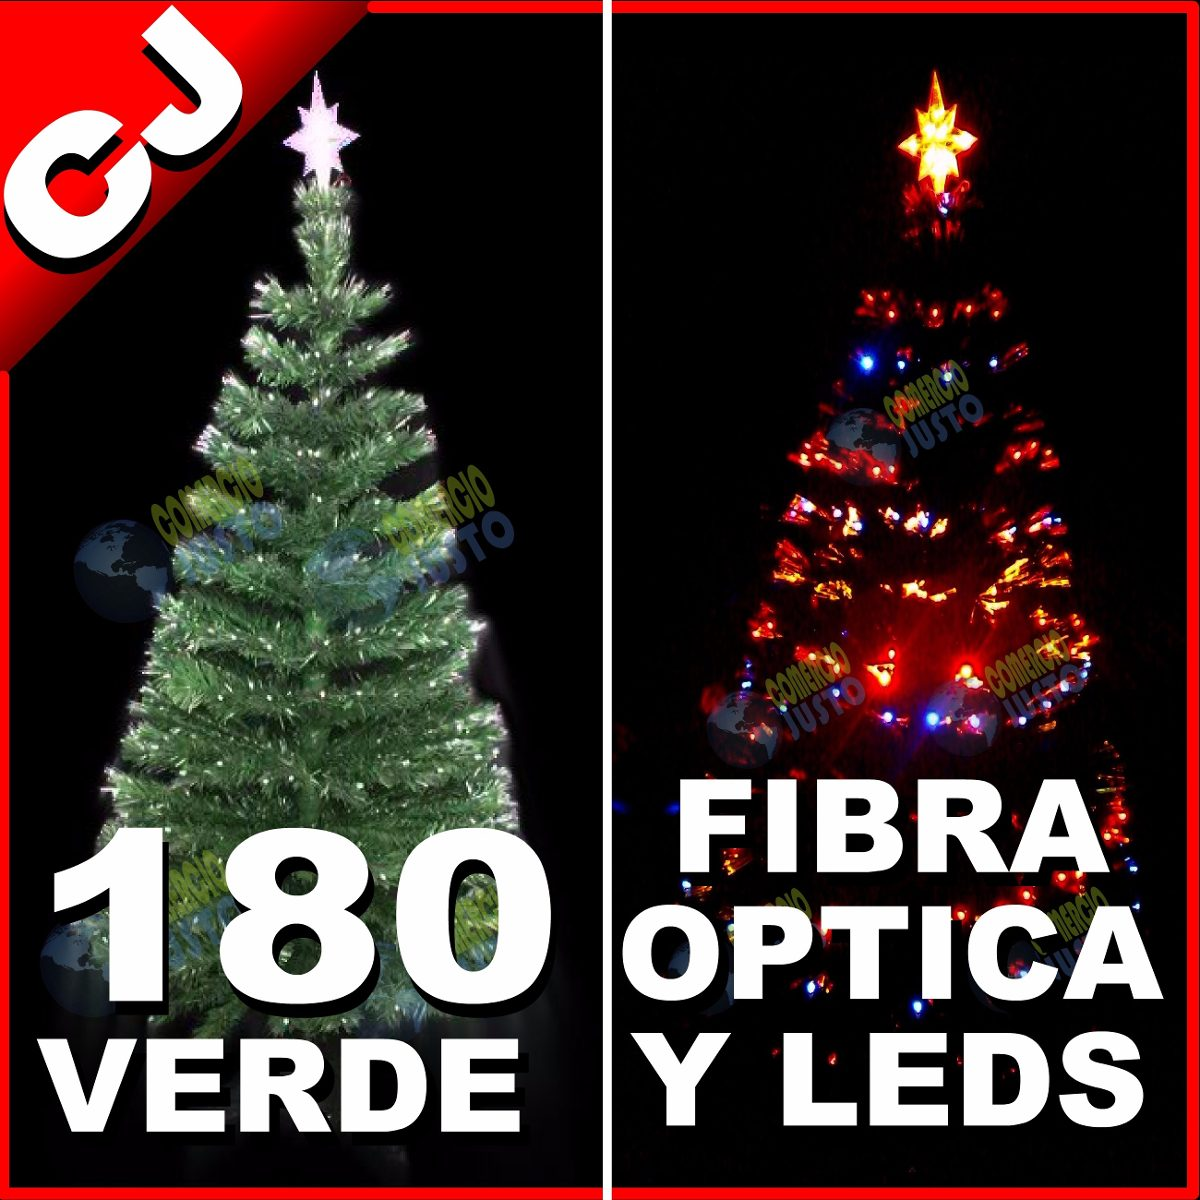 Arbol verde 180 fibra optica y luces led integradas navidad 1 en mercado libre - Luces led arbol navidad ...